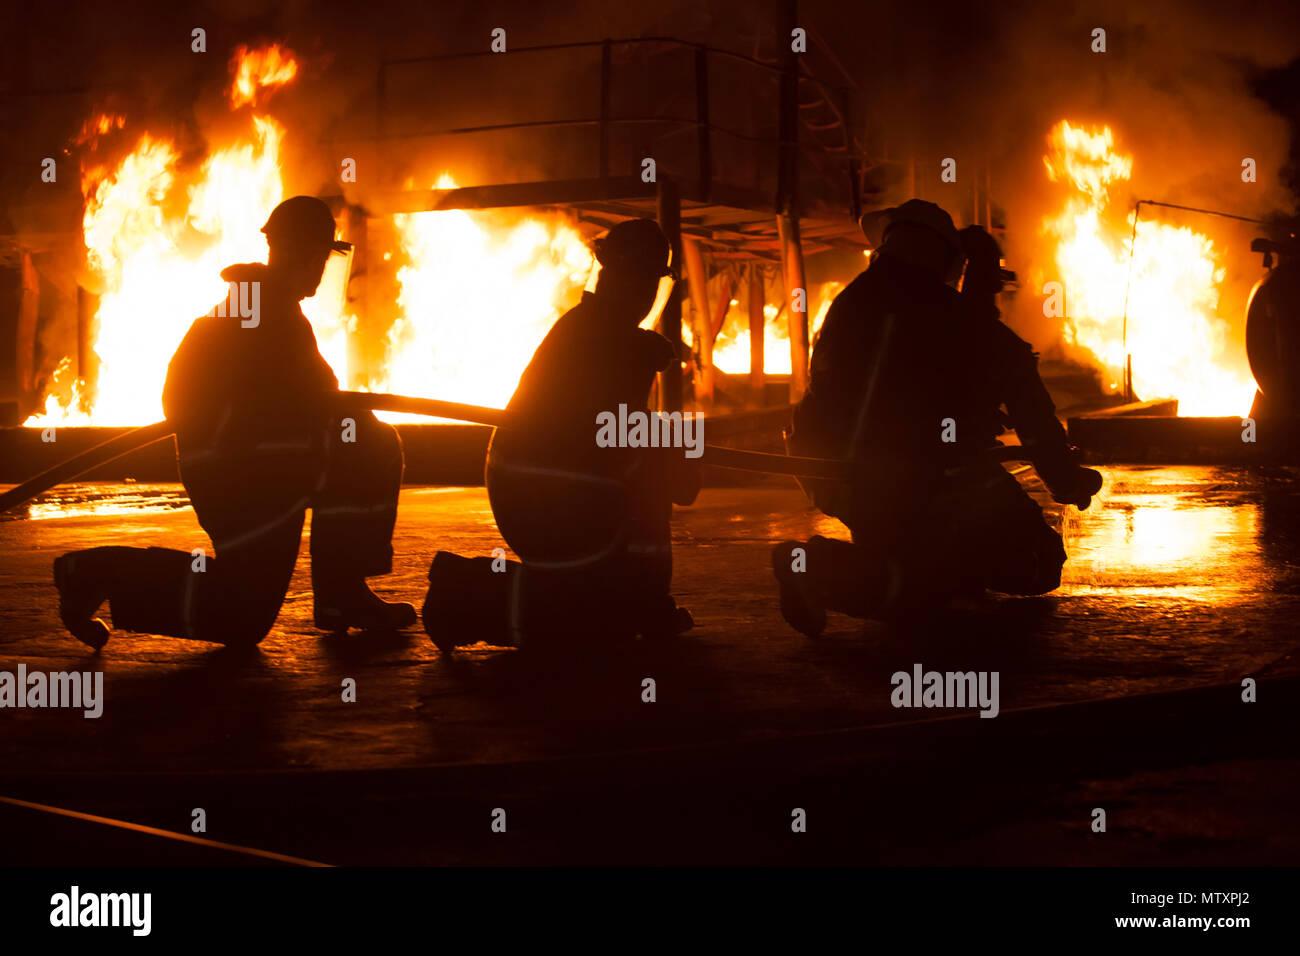 JOHANNESBURG, Südafrika - Mai, 2018 Feuerwehrmänner knien während der Brandbekämpfung Training Stockfoto